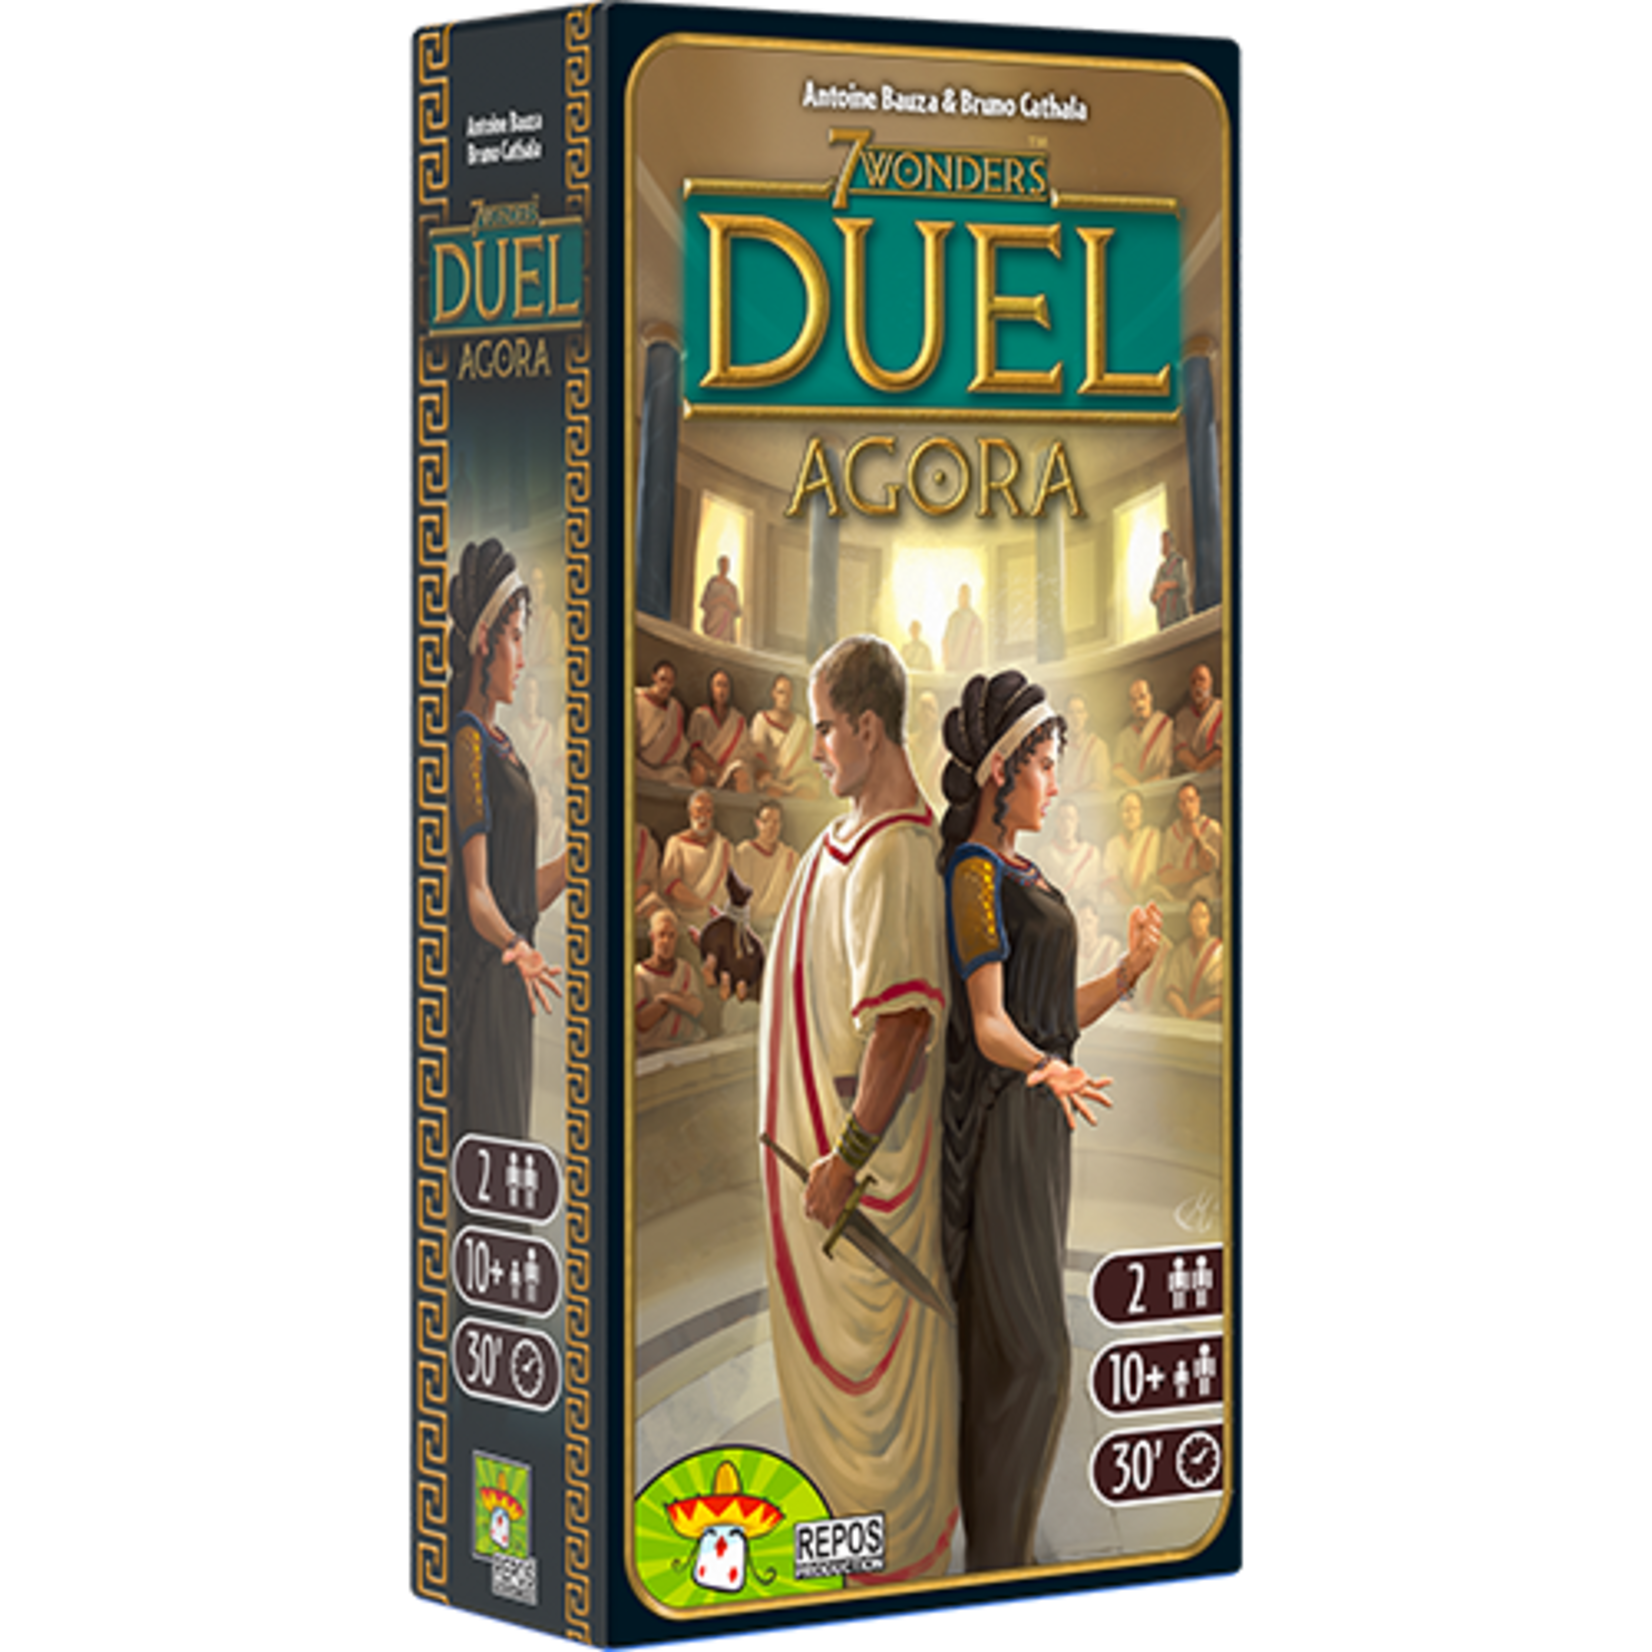 7 Wonders: Duel Agora